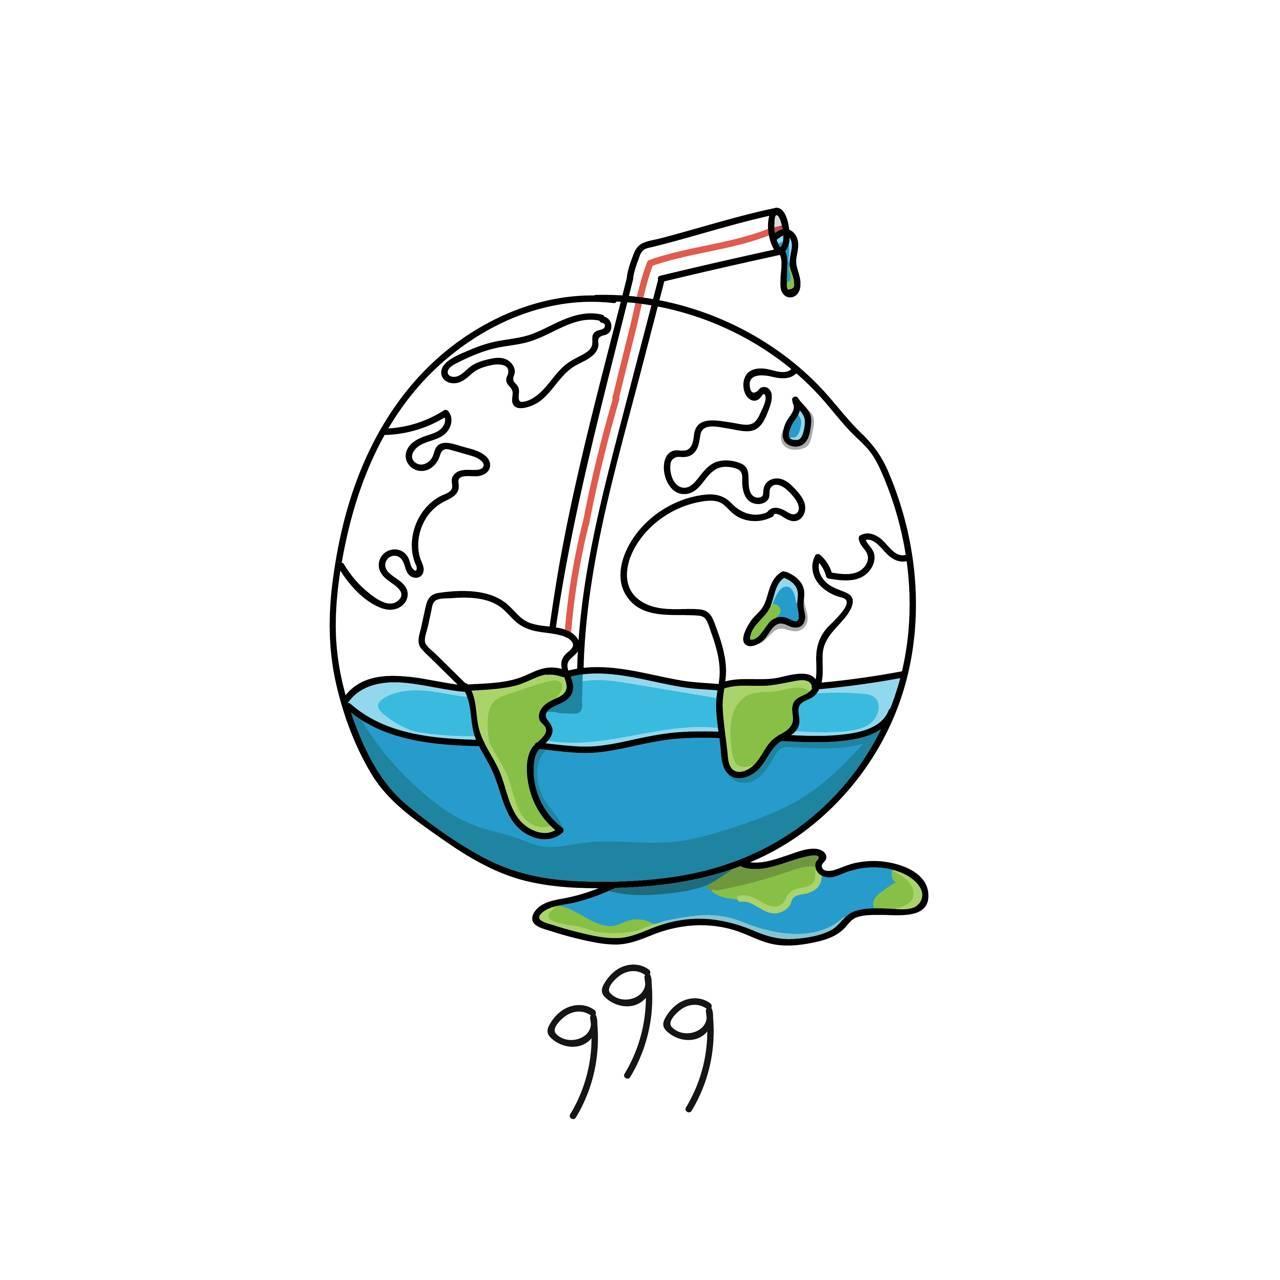 Cartoon Juice Wrld Wallpapers - Wallpaper Cave